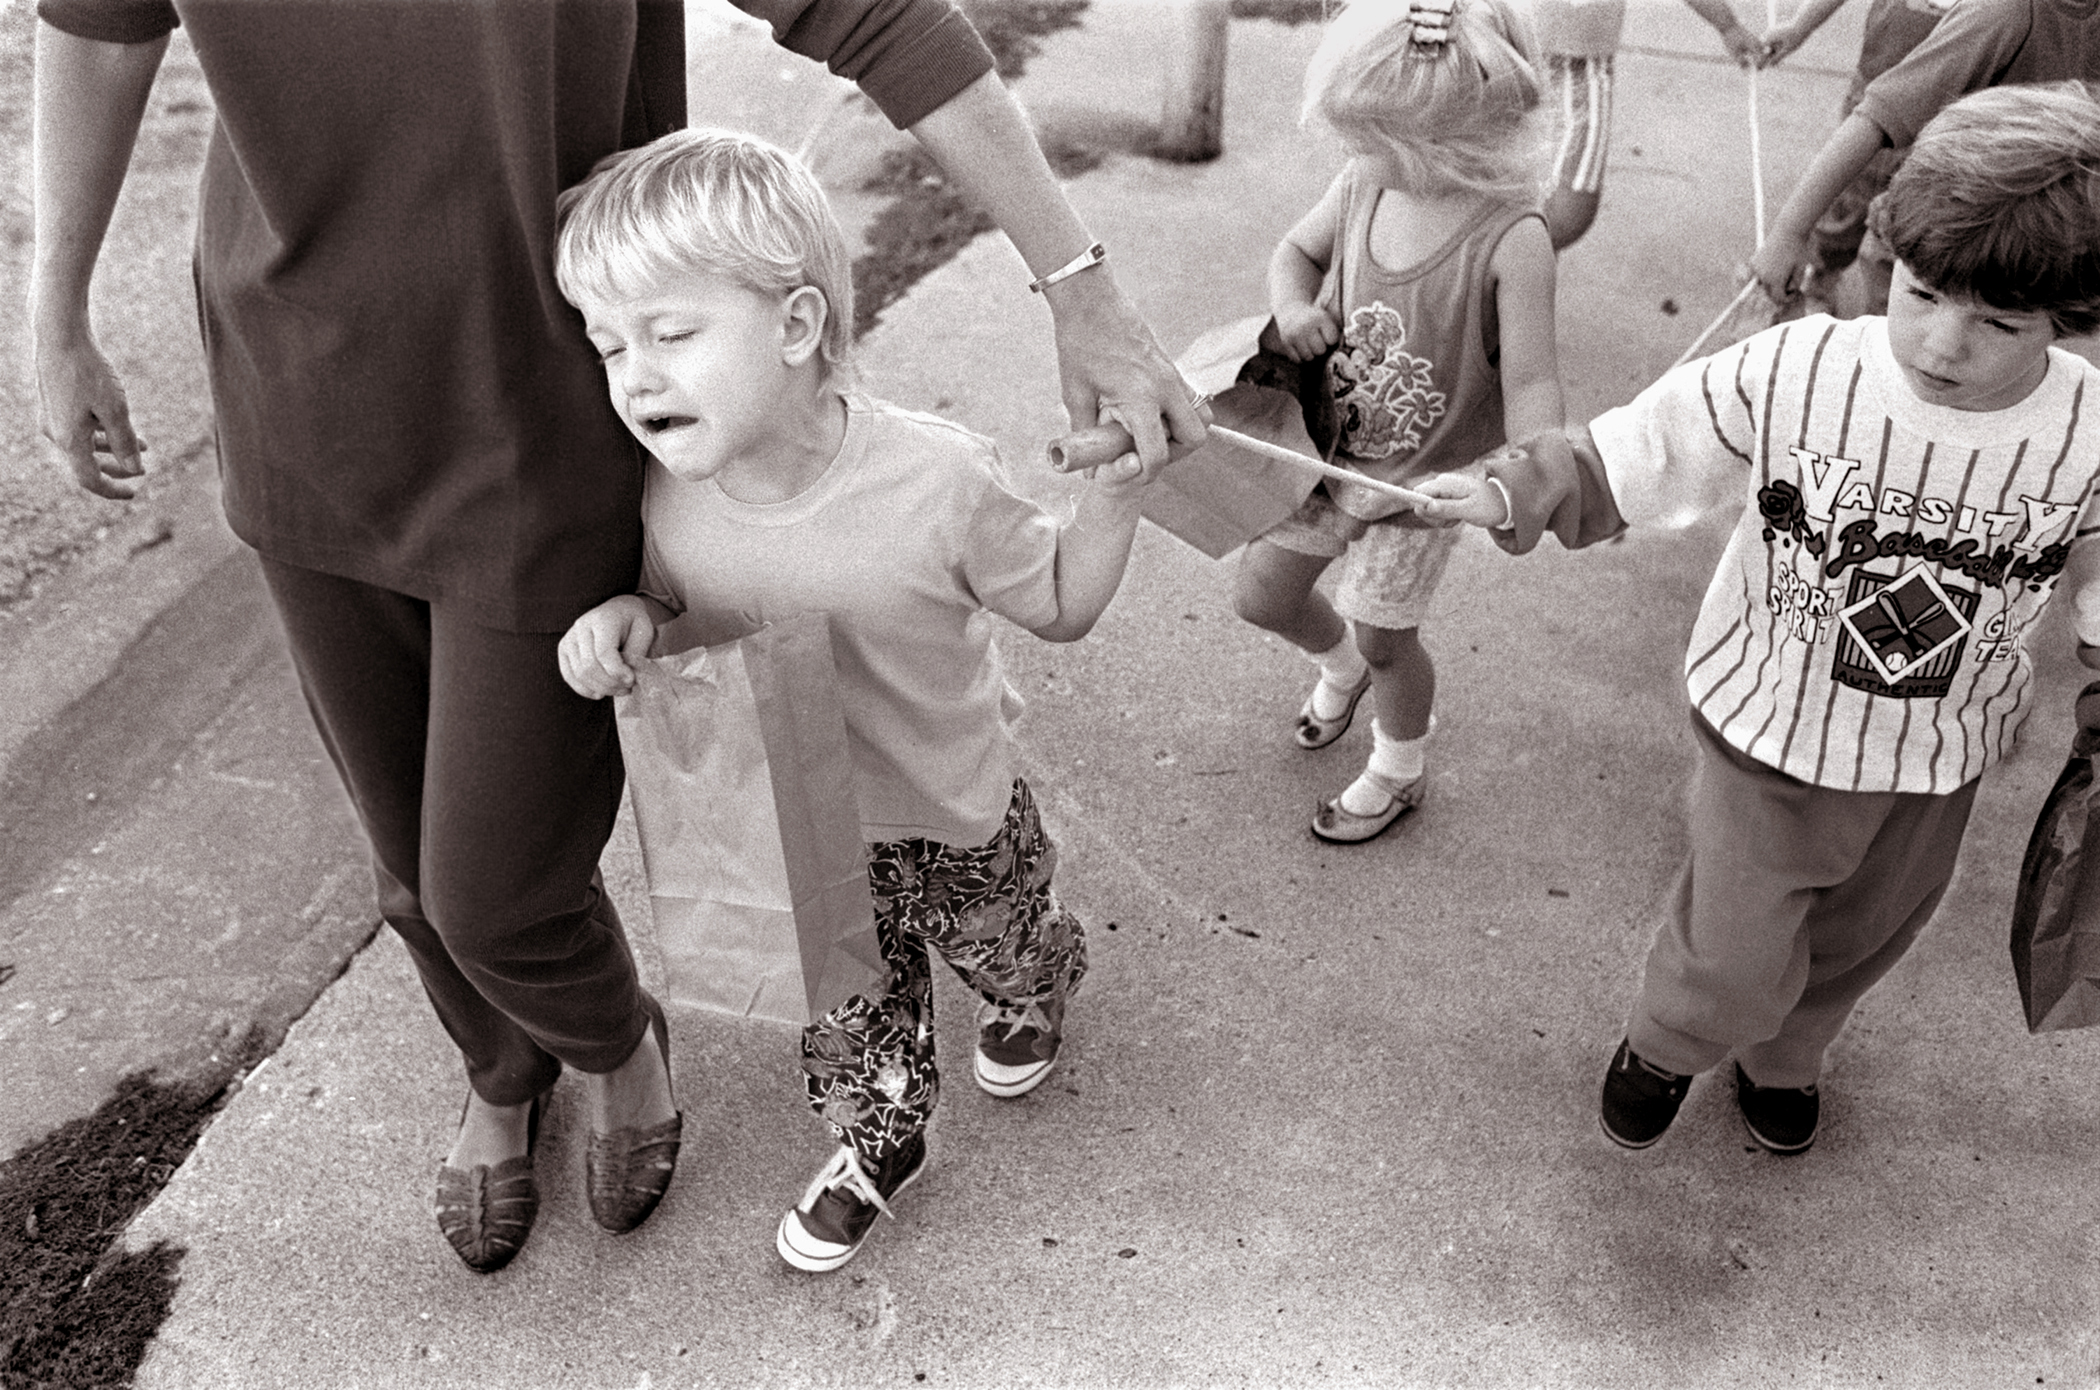 levi autism photostory by ken harper 2.jpg